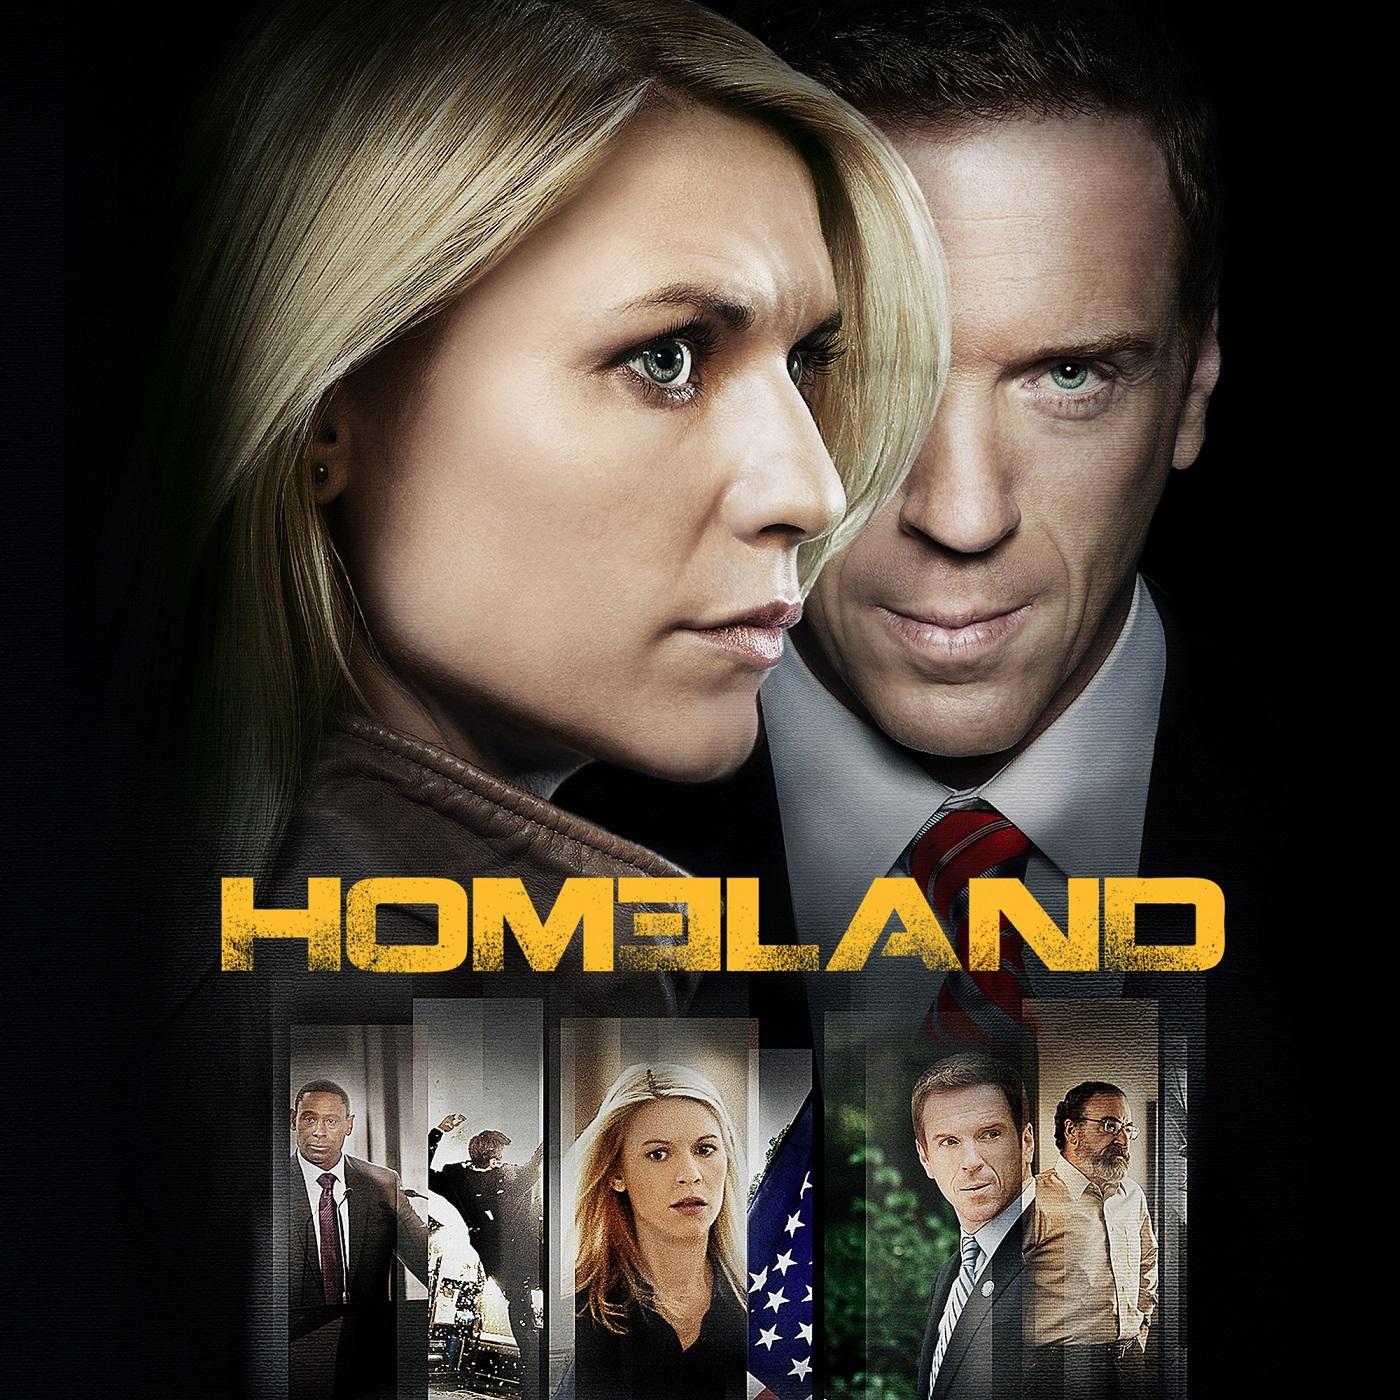 Homeland S01-04 | S04E00=E11 HDTV/ 720p Ongv